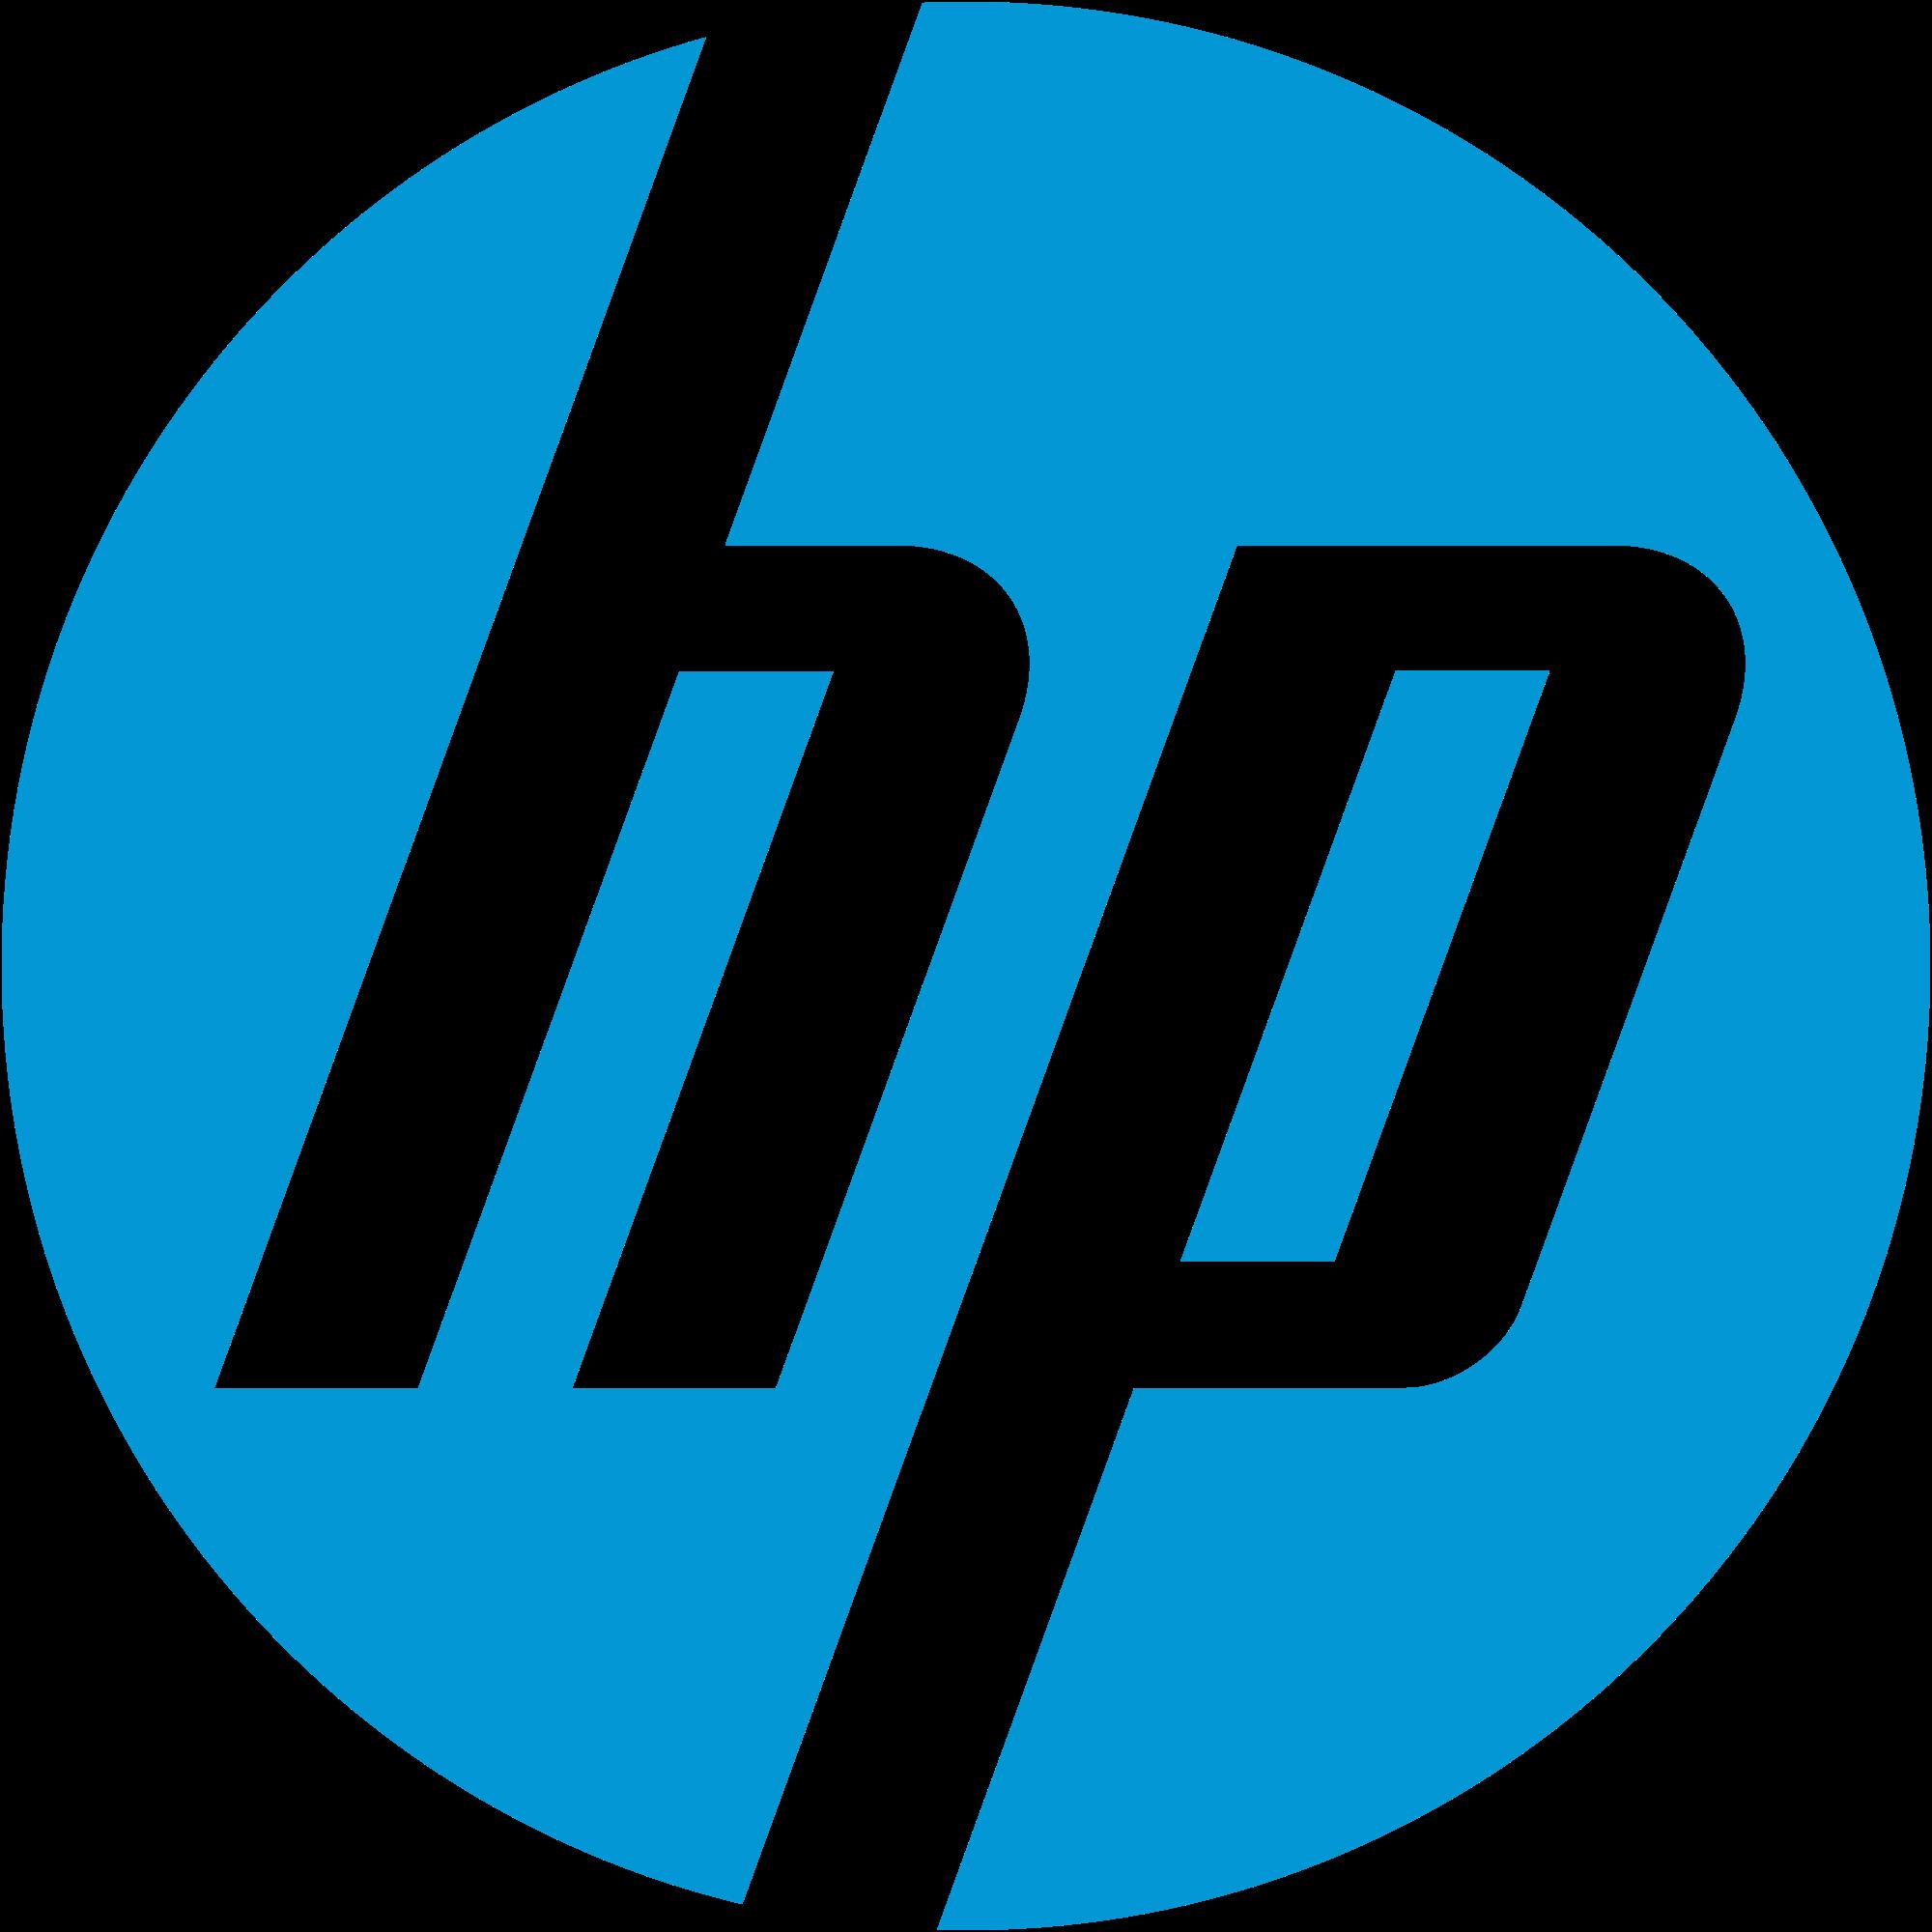 HPが今後三年間で従業員4千人を削減と発表